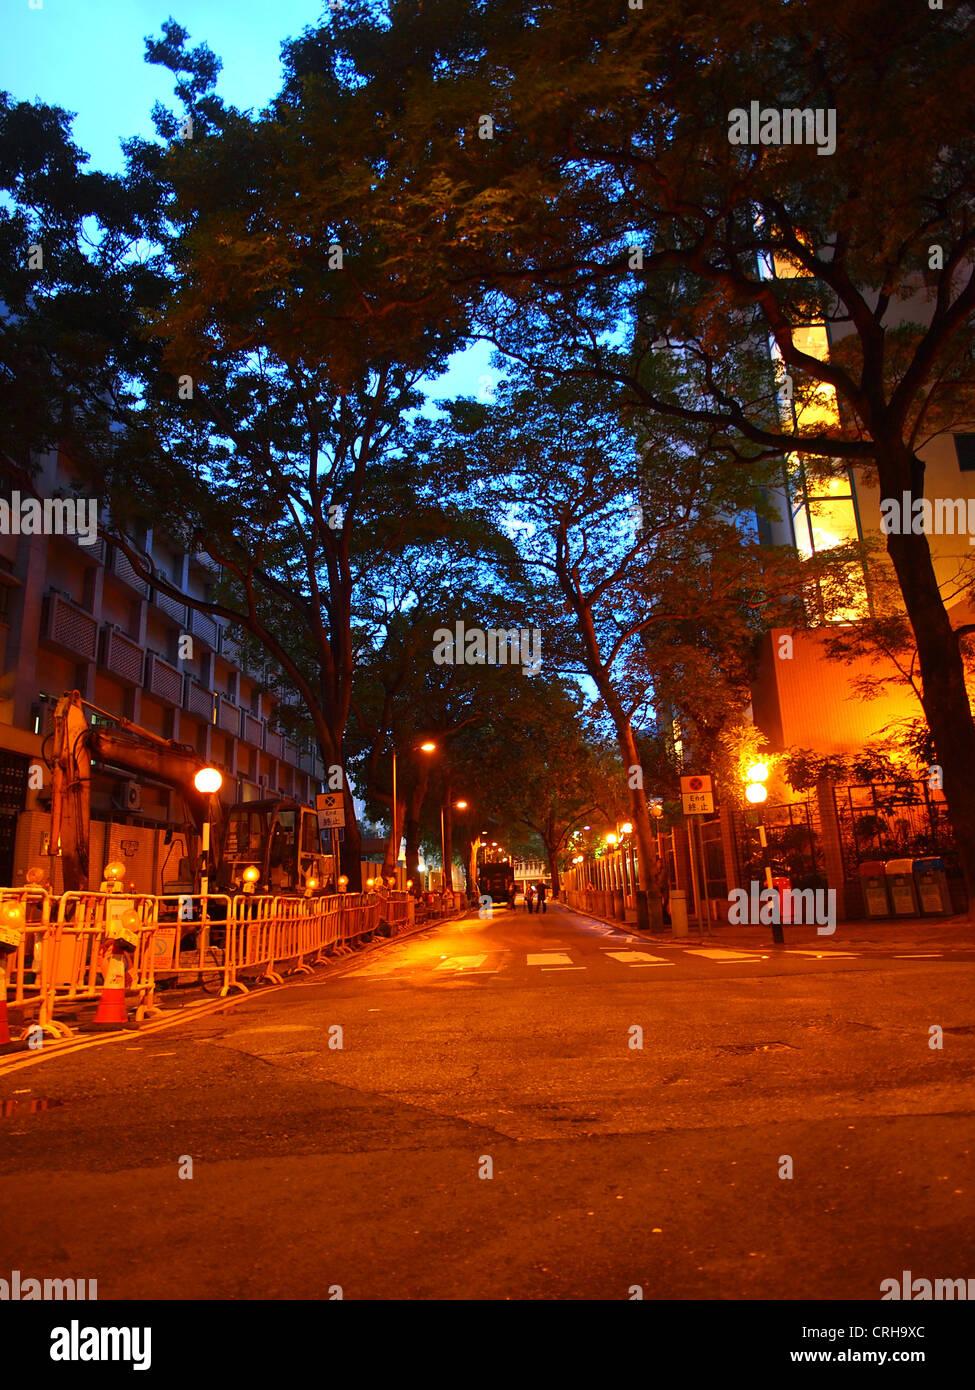 Sens urbain de nuit Photo Stock